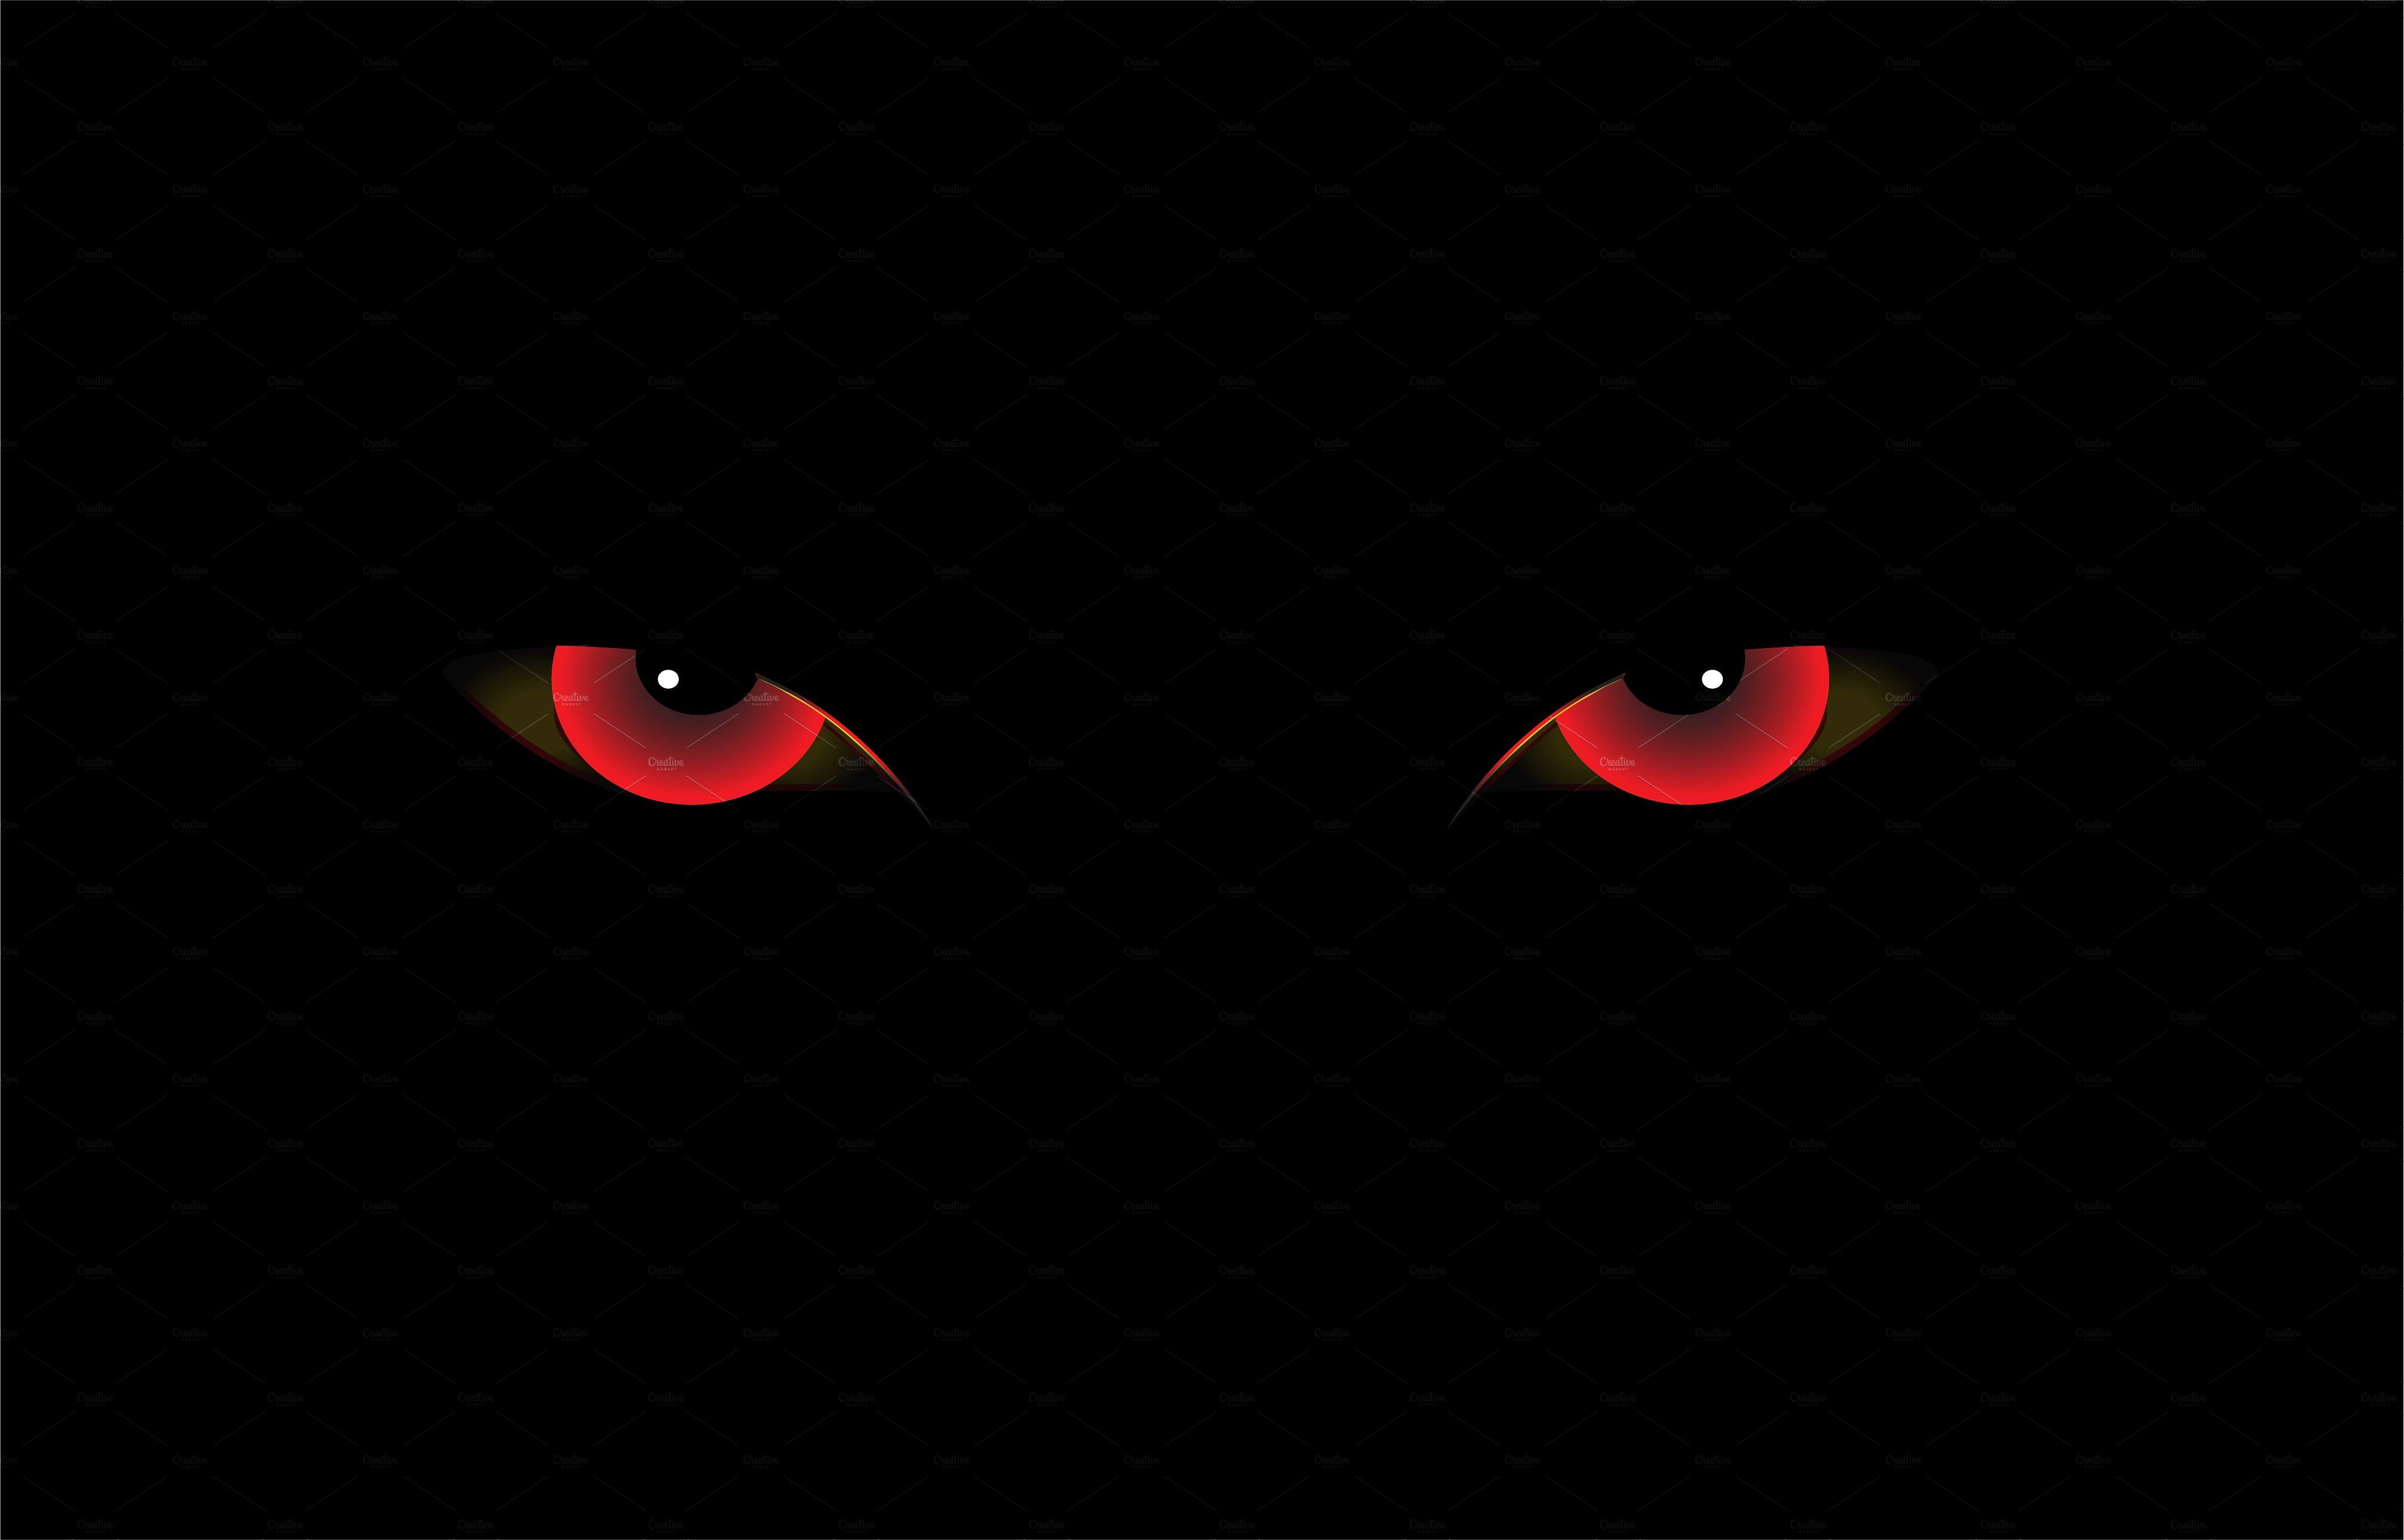 Demon Eyes Red Vector Demon Eyes Eyes Wallpaper Scary Eyes